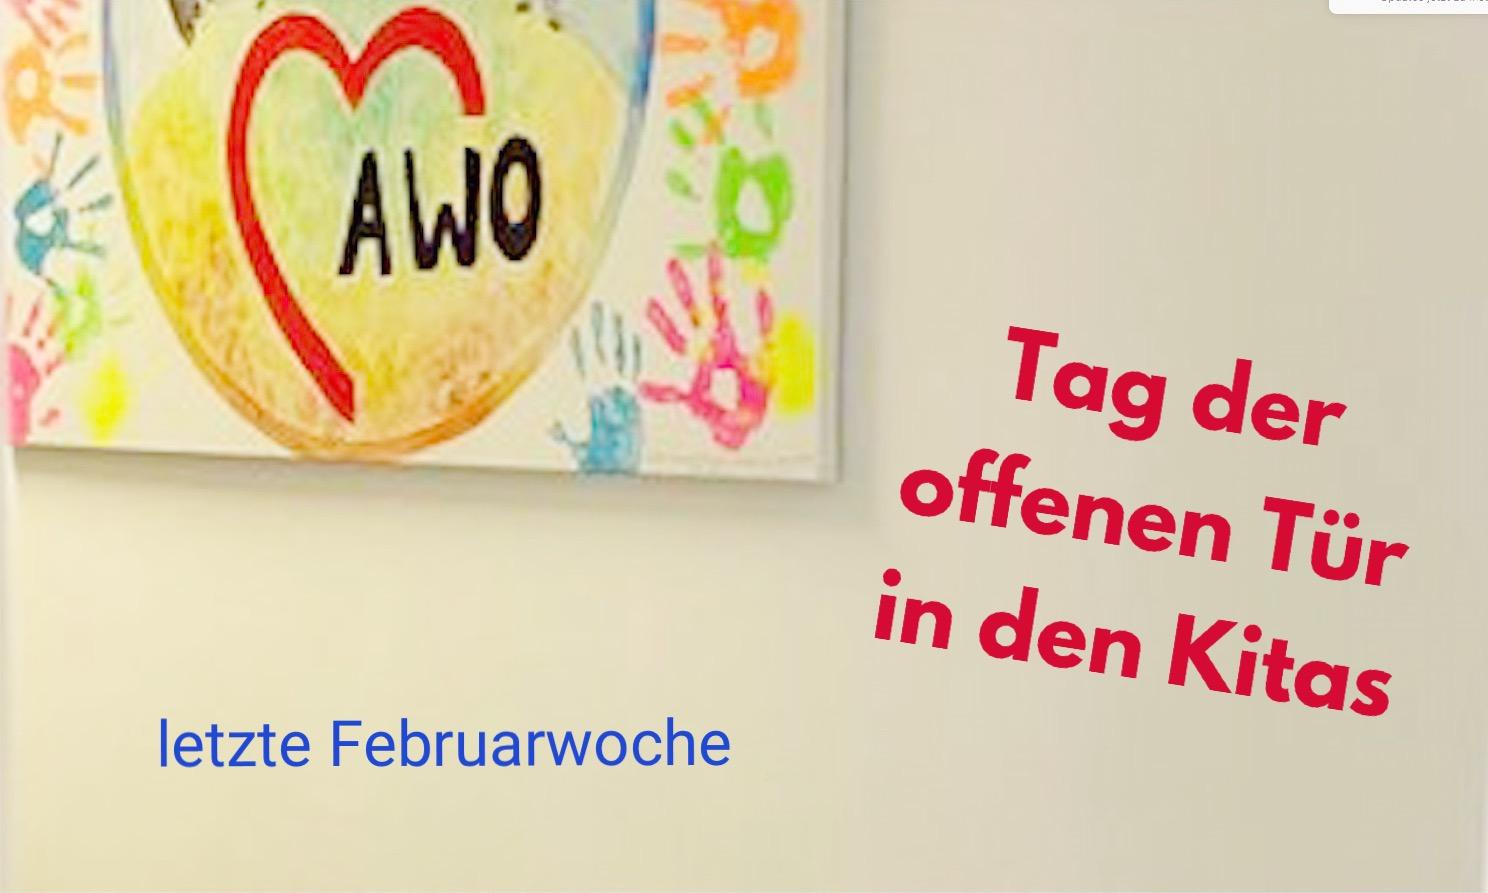 AWO: Tag der offenen Türen in den Kitas